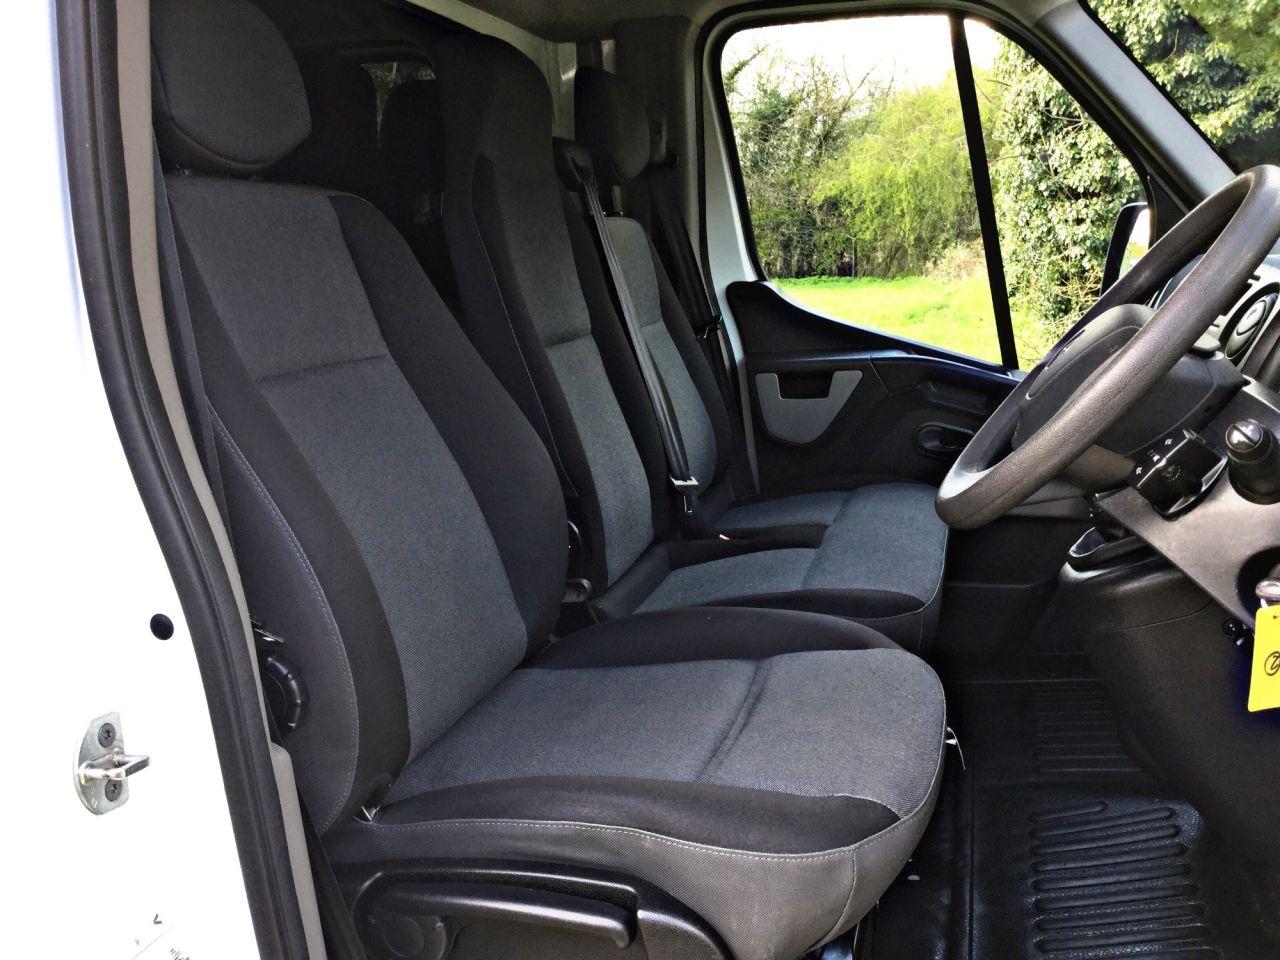 2016 Renault Master Ll35 Business DCI L/R C/C £13,995